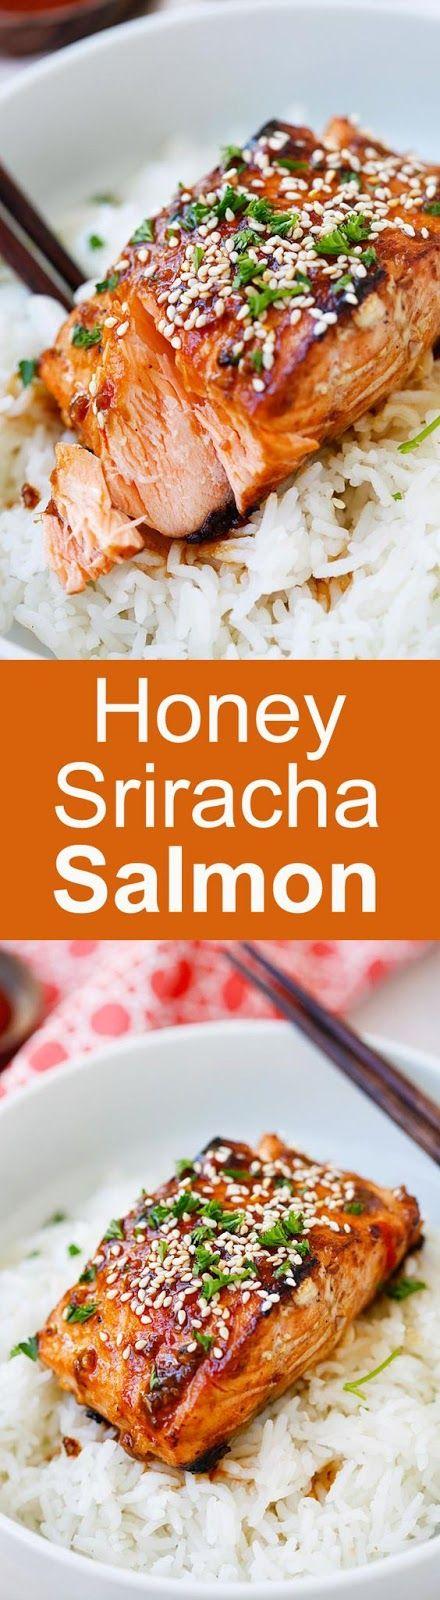 Sweet & Spicy Honey Sriracha-Glazed Salmon Recipe | Food And Cake Recipes